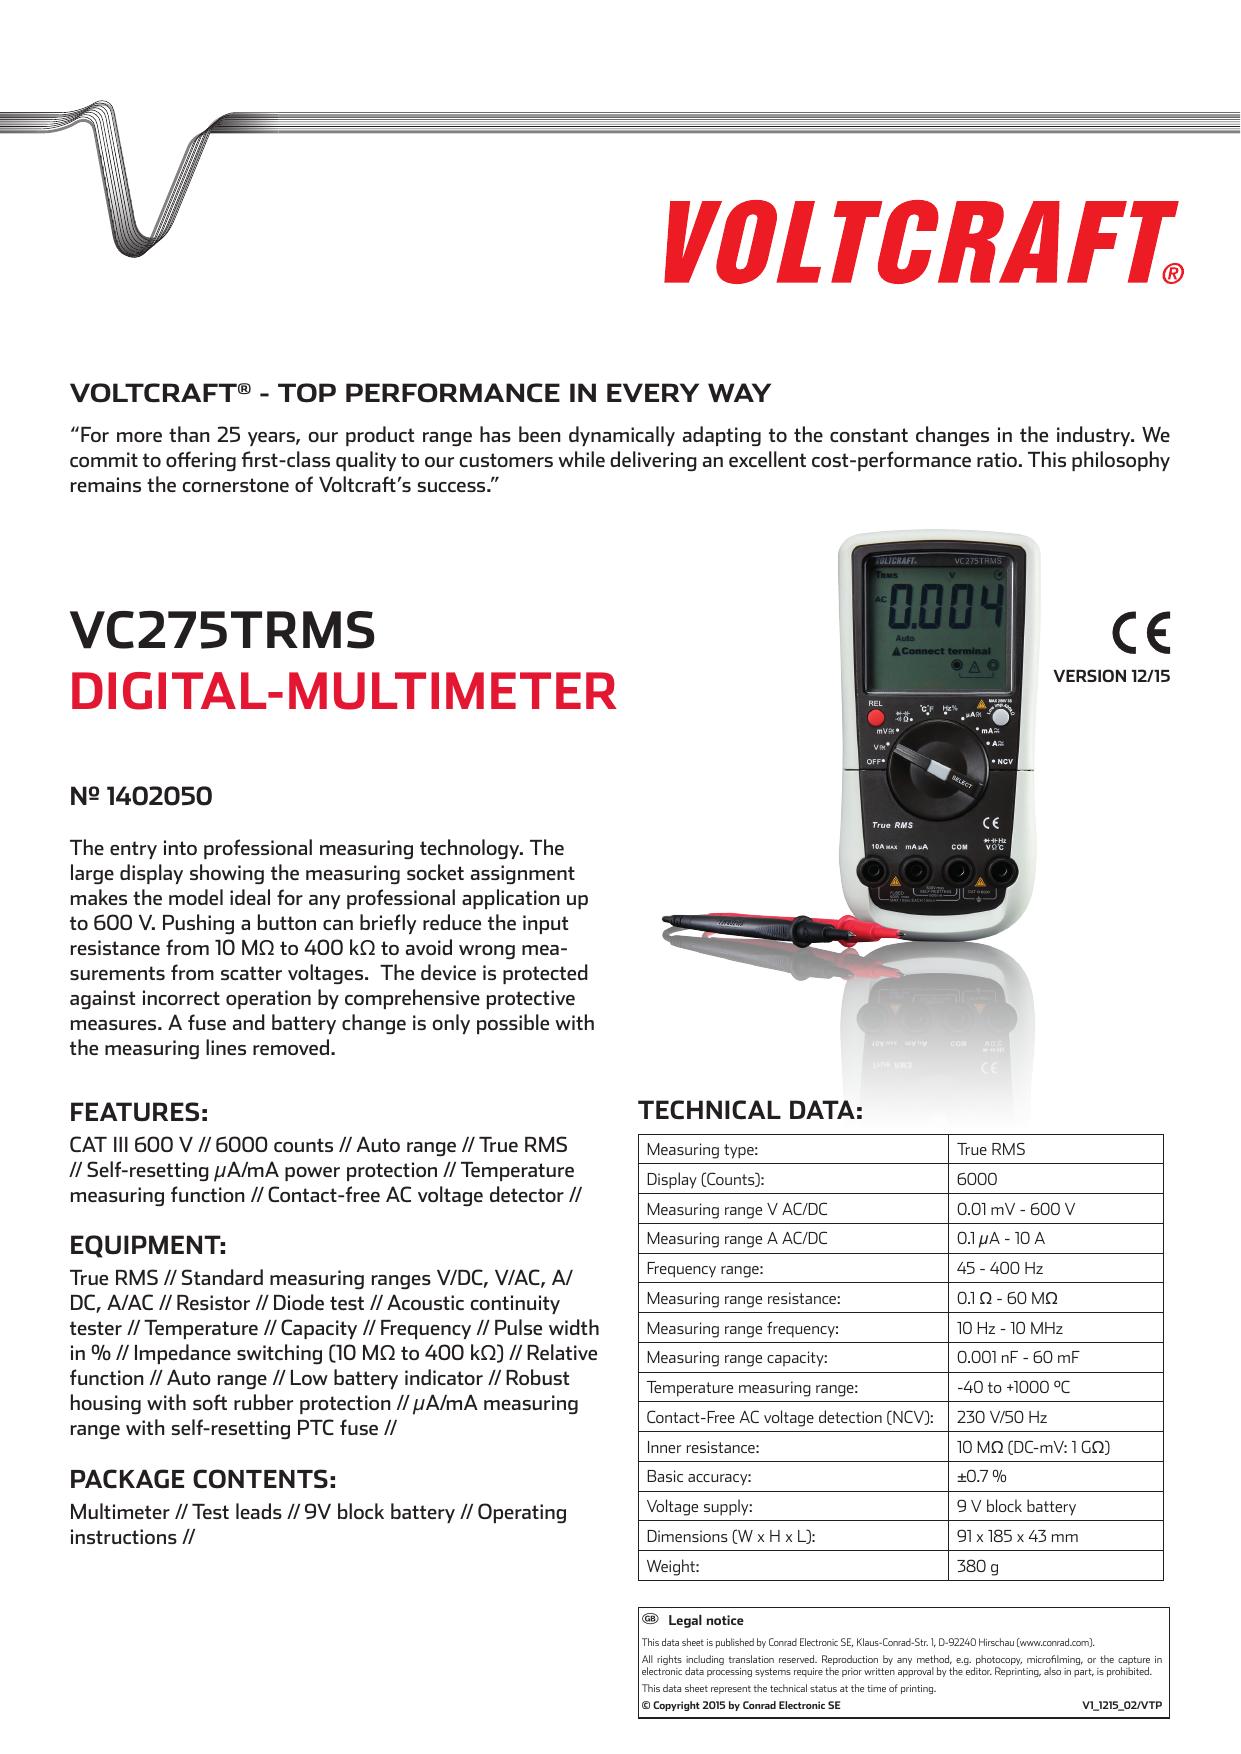 Vc275trms Digital Multimeter Manualzz